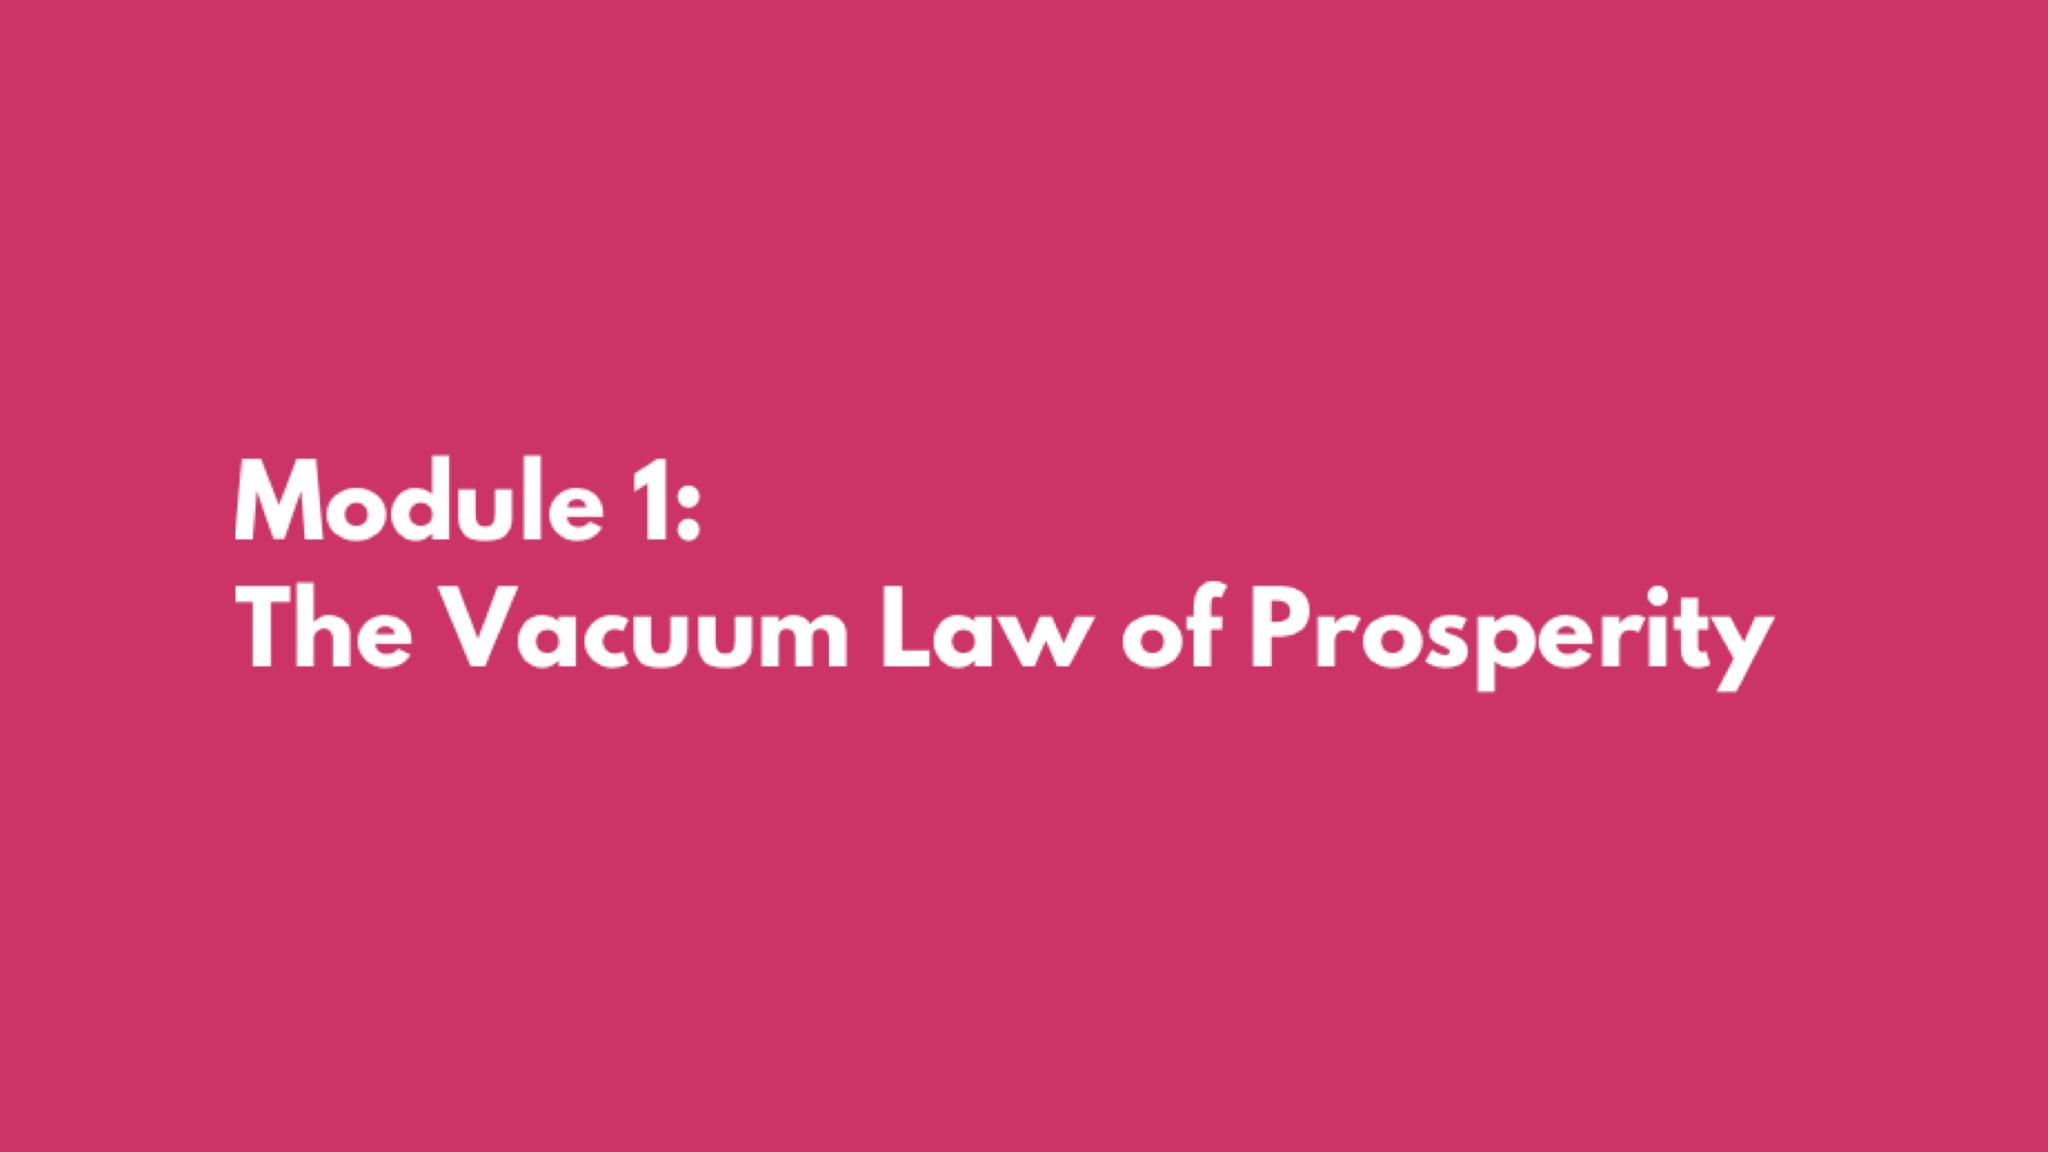 Module 1: The Vacuum Law of Prosperity